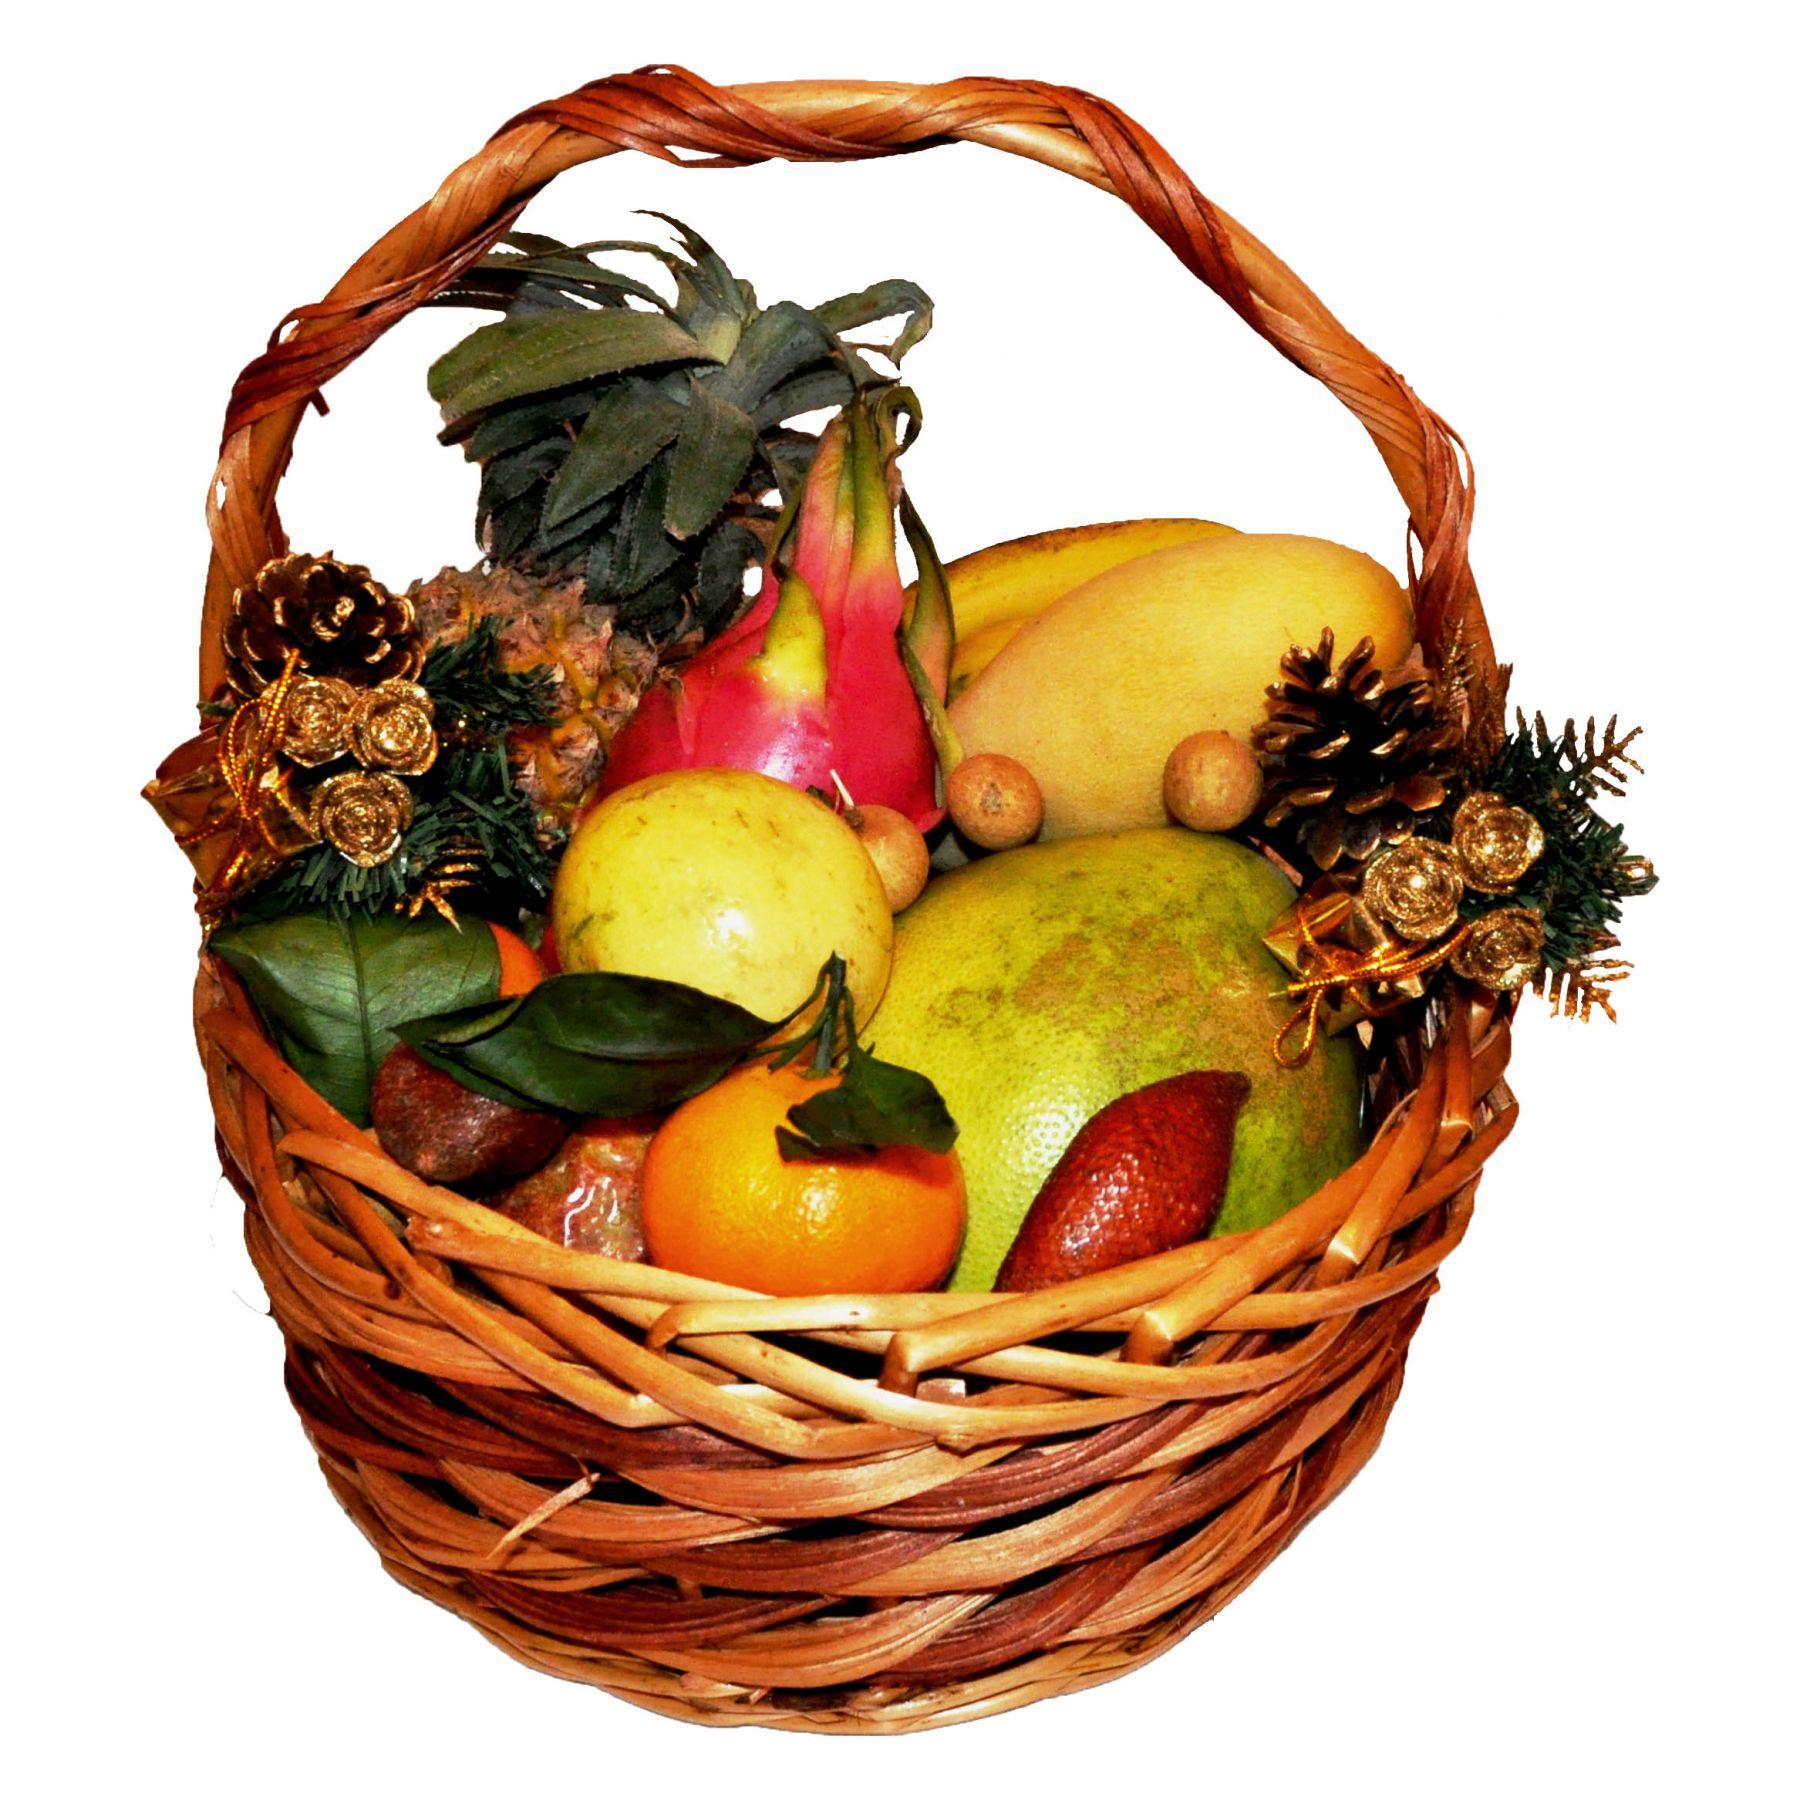 http://fruit-island.ru/images/upload/korzina-s-fruktami-frukty-pod-lkoj.jpg